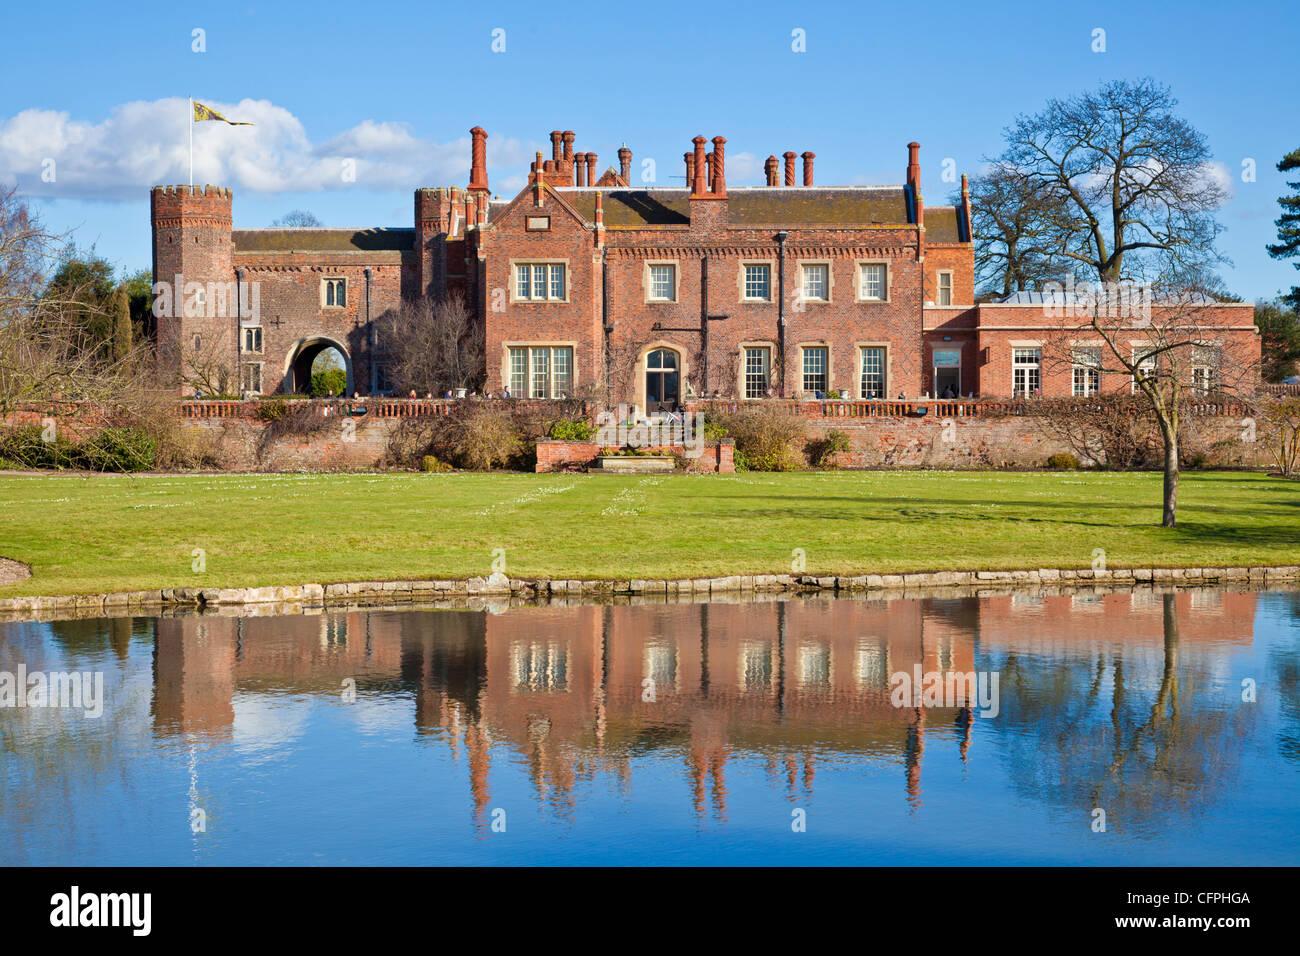 Victorian house, garden and lake at Hodsock Priory, Blyth, near Worksop Nottinghamshire, England, GB, UK, EU, Europe - Stock Image